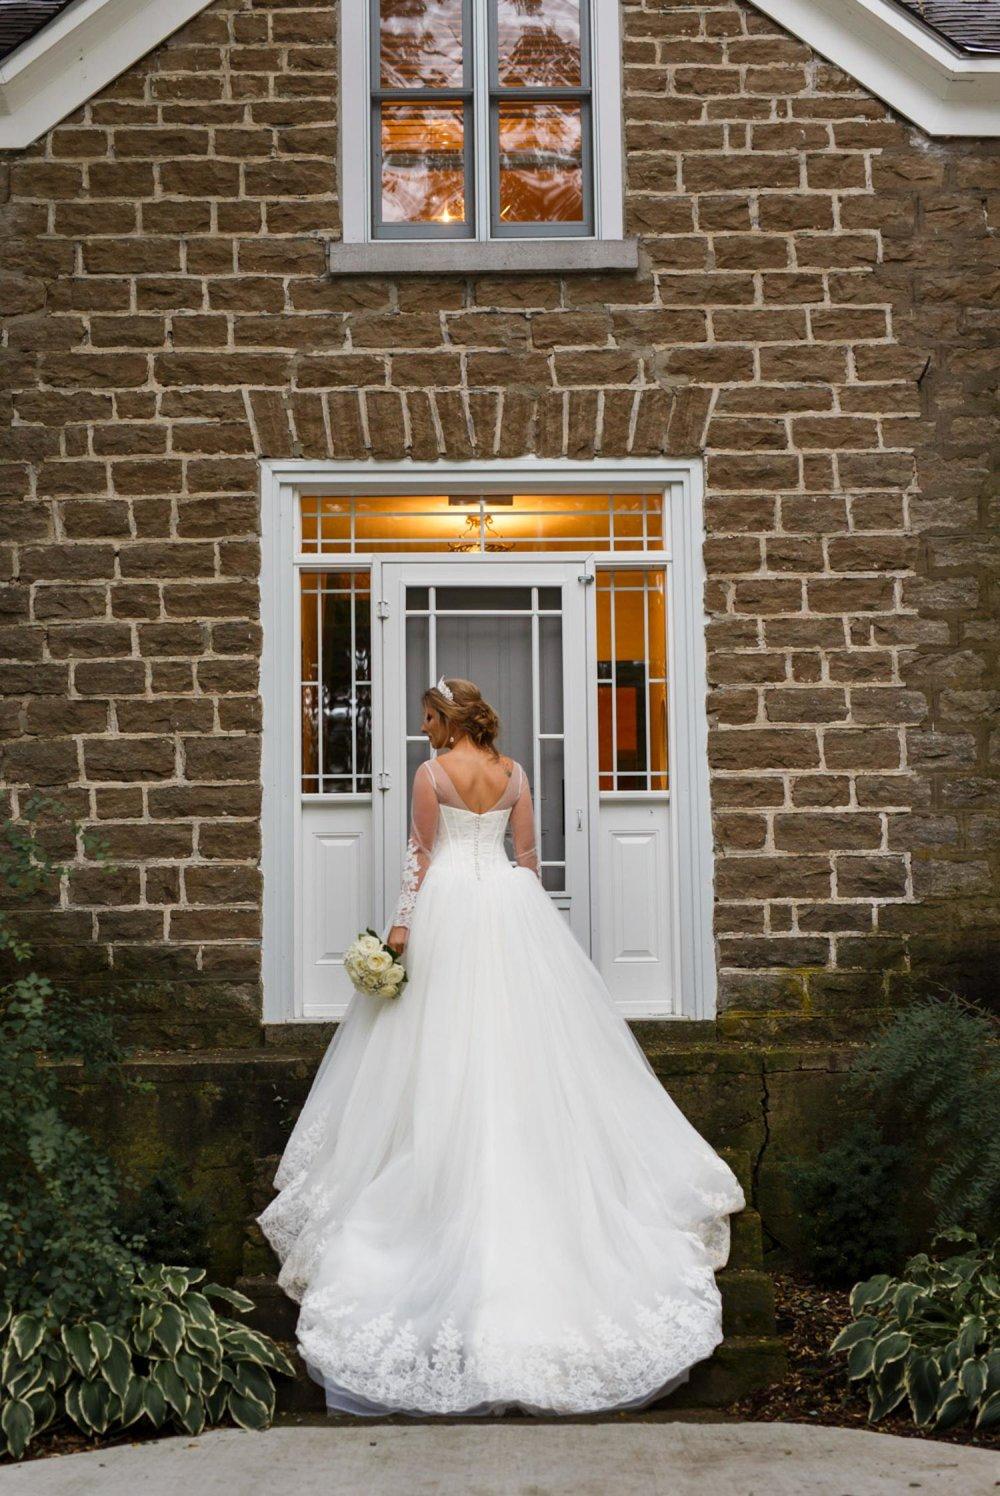 bridal portrait with a beautiful wedding dress